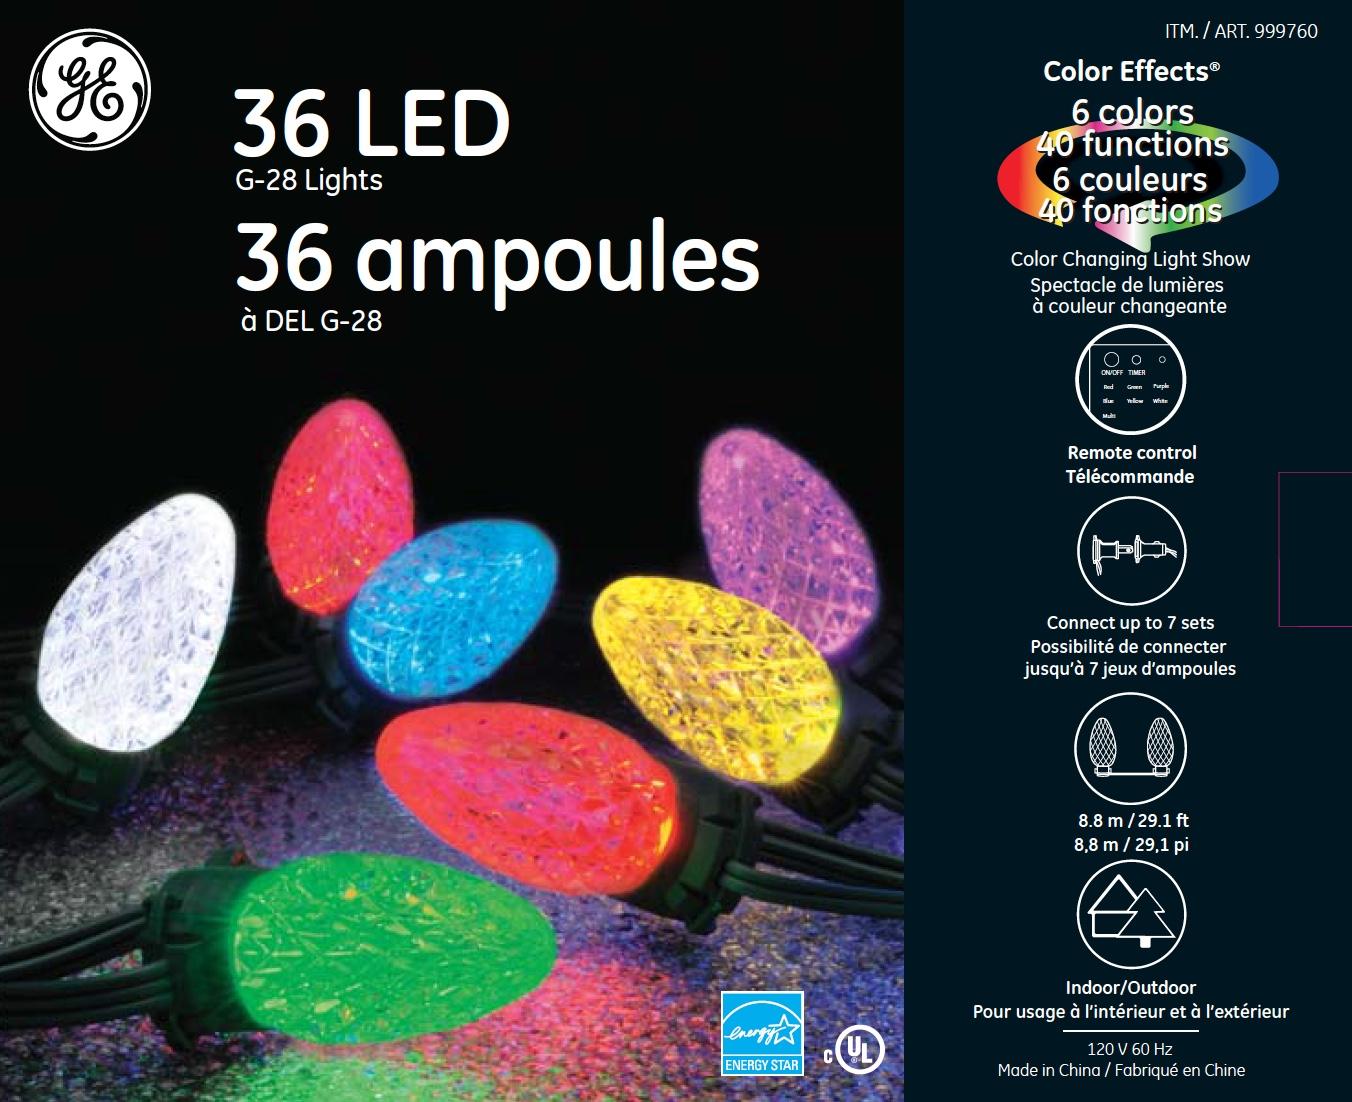 00106 Ge Color Effects 174 Led G 28 Lights 36ct Rgb Ge